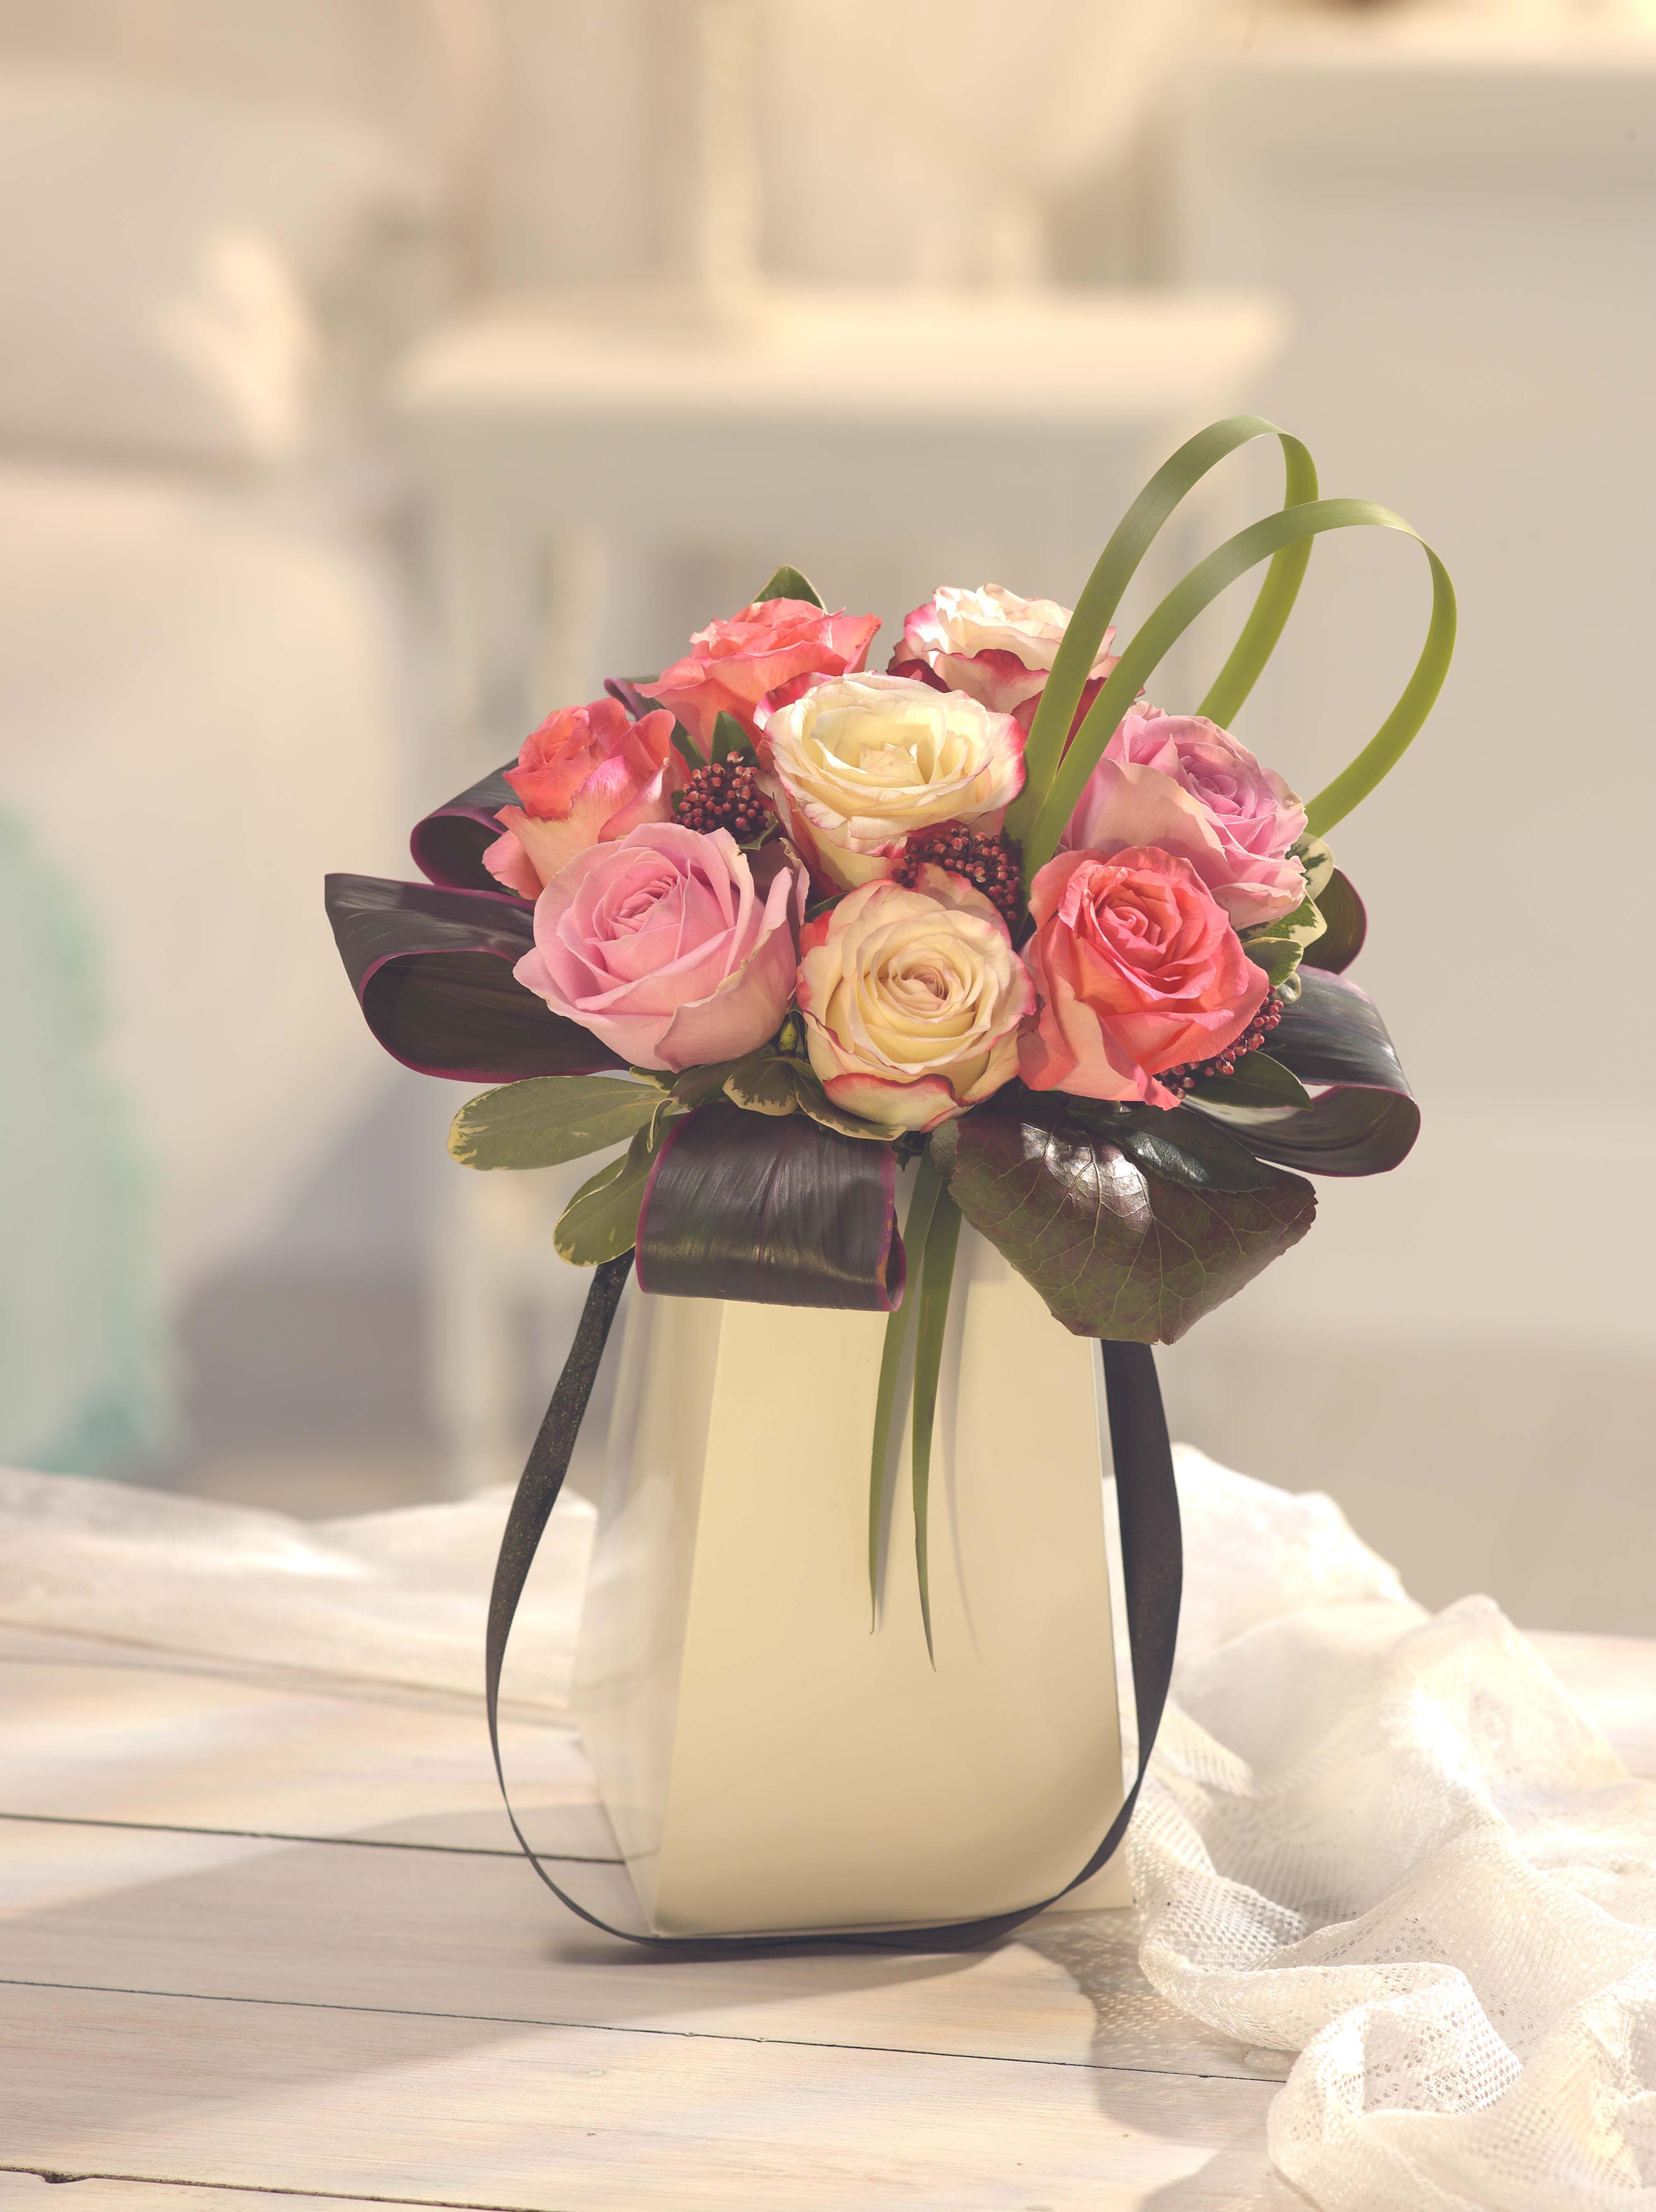 Magic Moments Floral Boutique Design Wedding Flowers Flowers